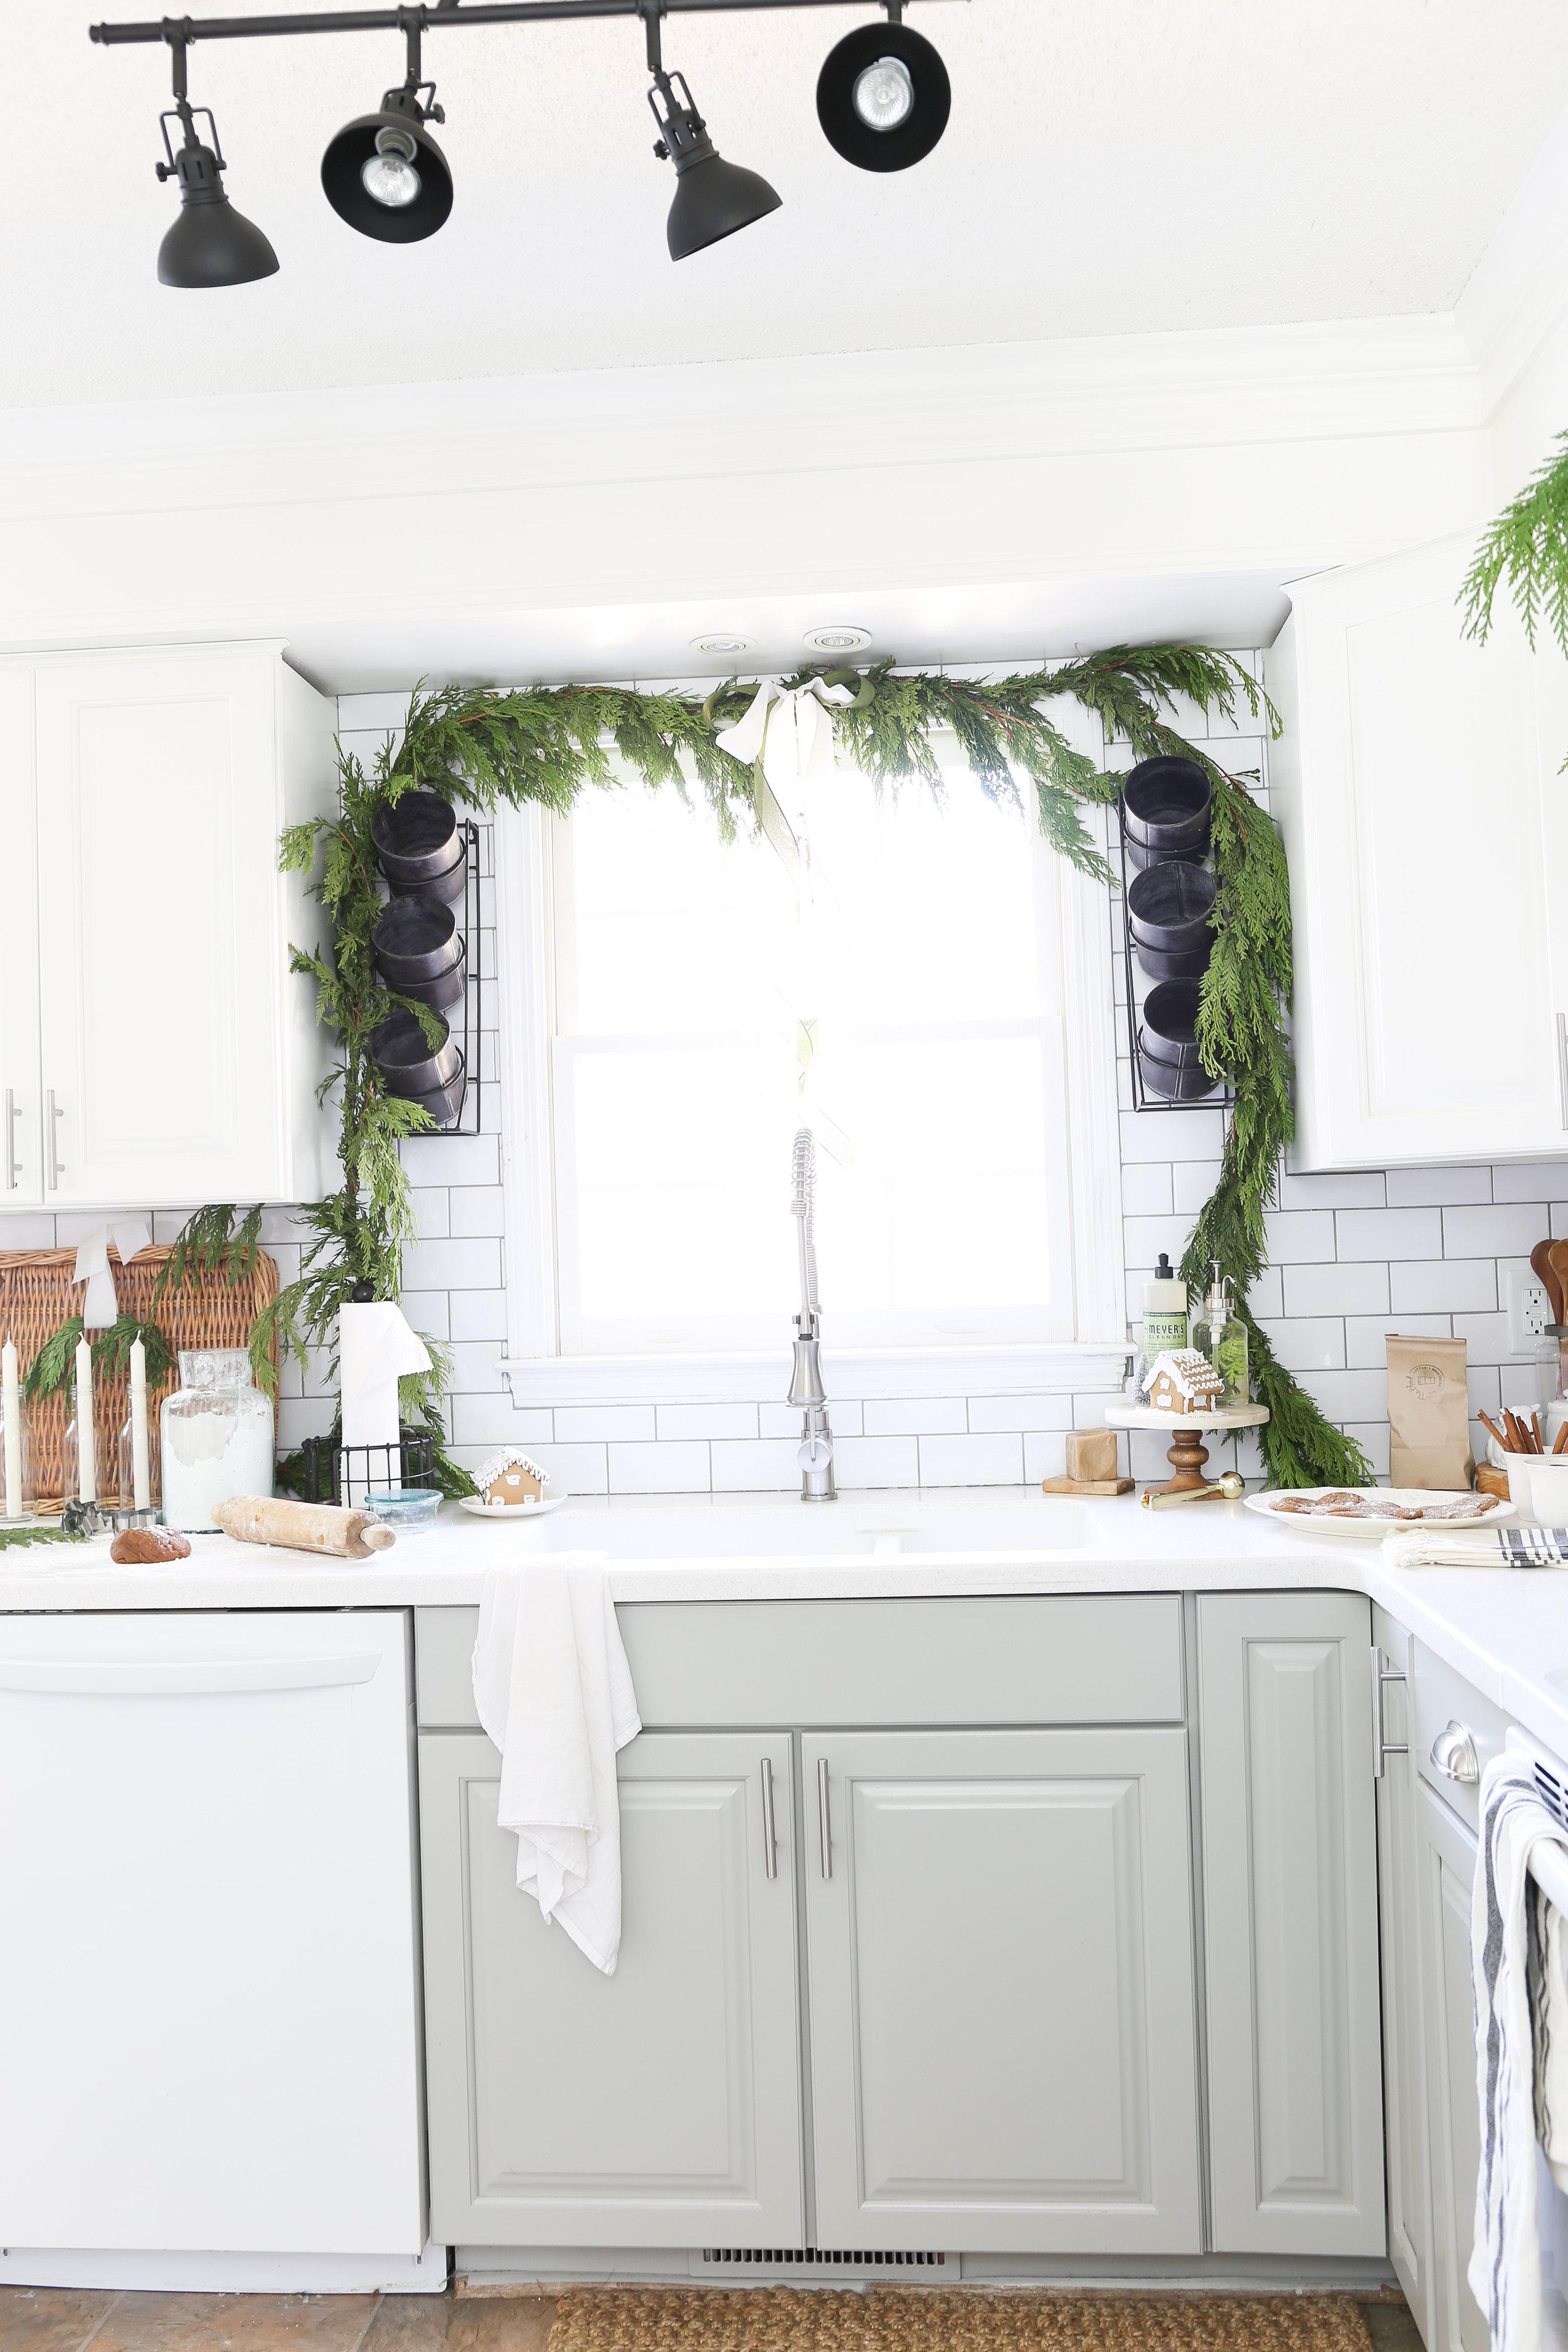 Christmas 2017 Home Tour: Deck The Blogs-Garland above kitchen sink- Plum Pretty Decor & Design's Christmas Home Tour